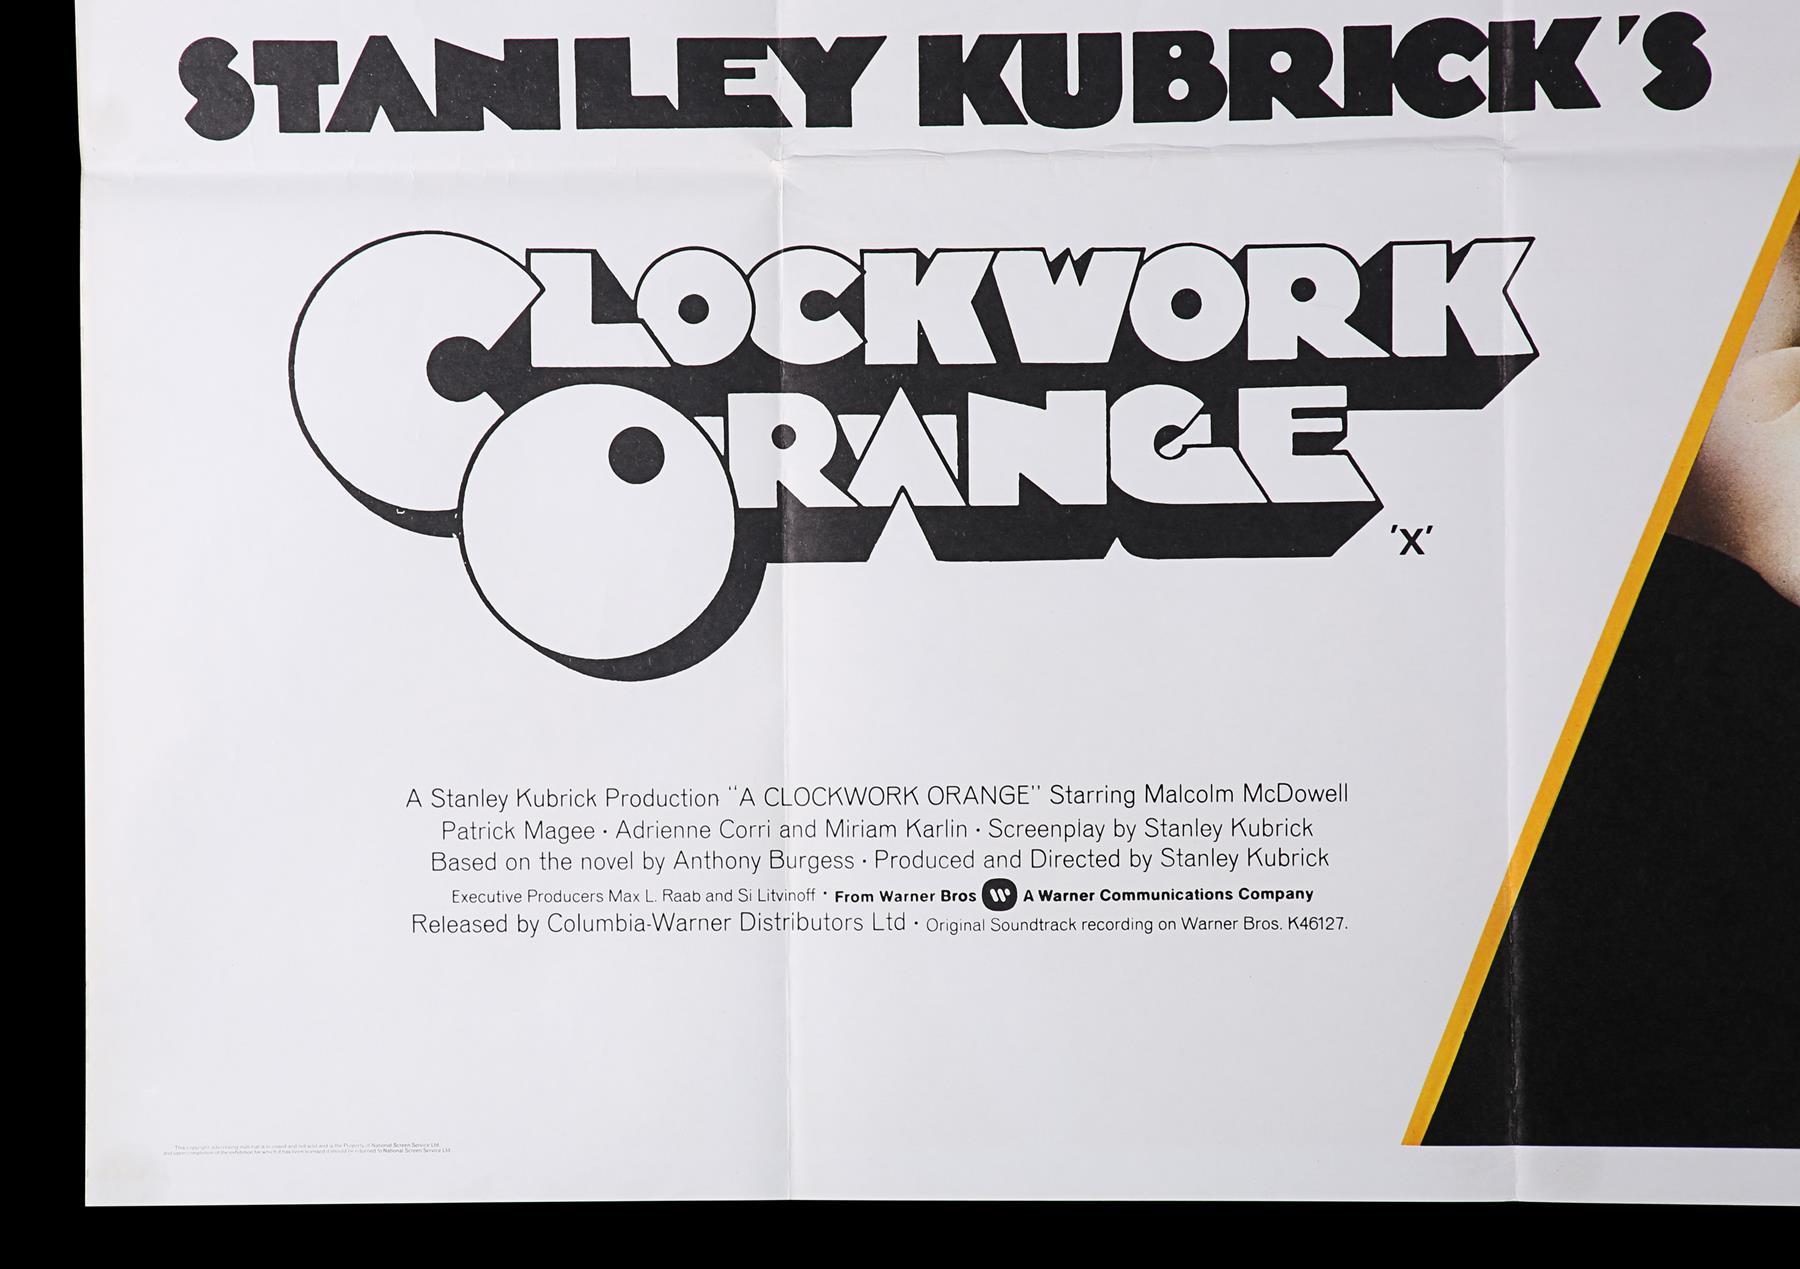 A CLOCKWORK ORANGE (1971) - UK Quad, 1971 - Image 5 of 6